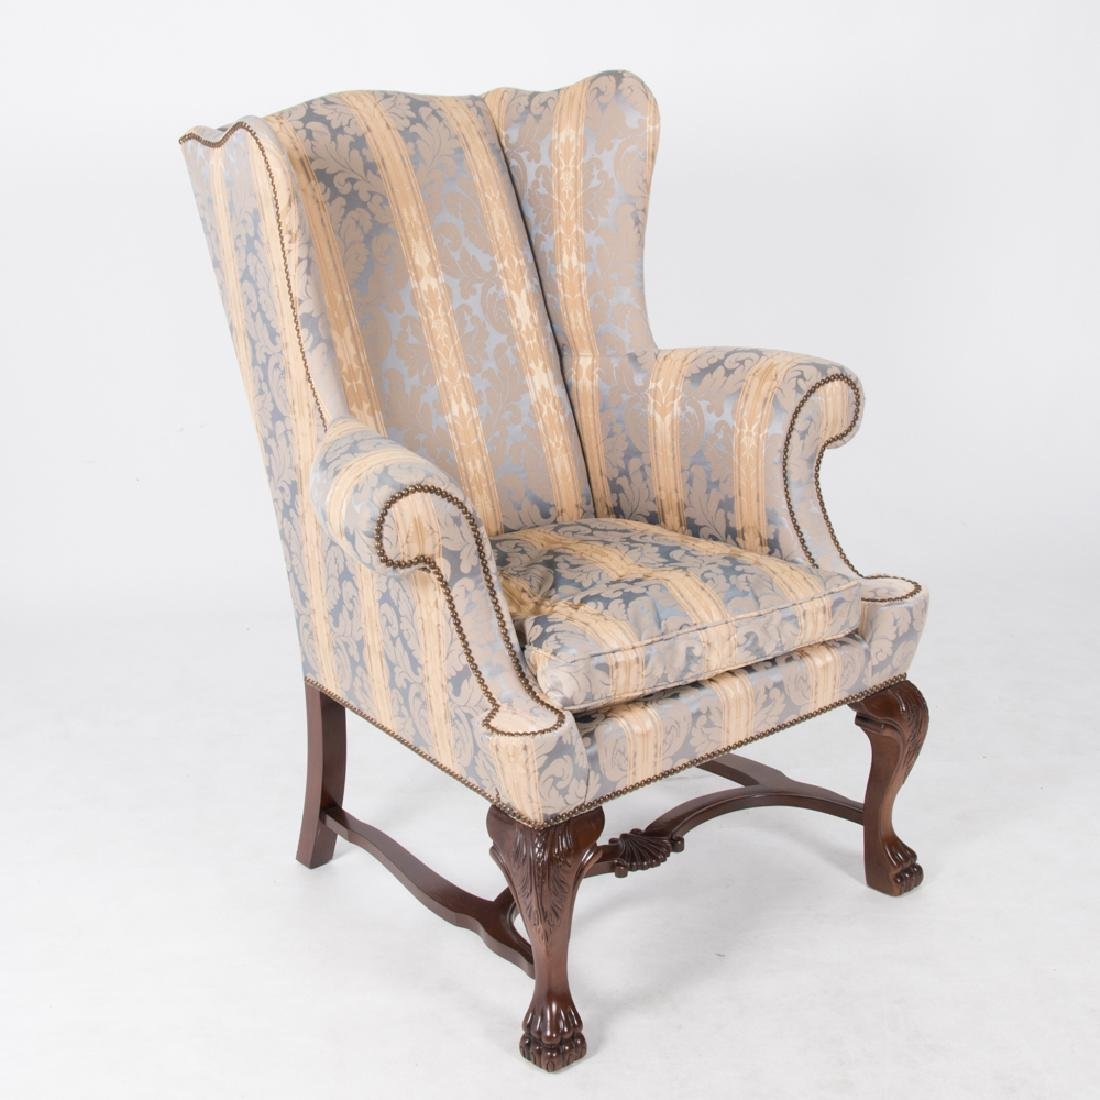 A Baker Furniture Georgian Style Damask Upholstered